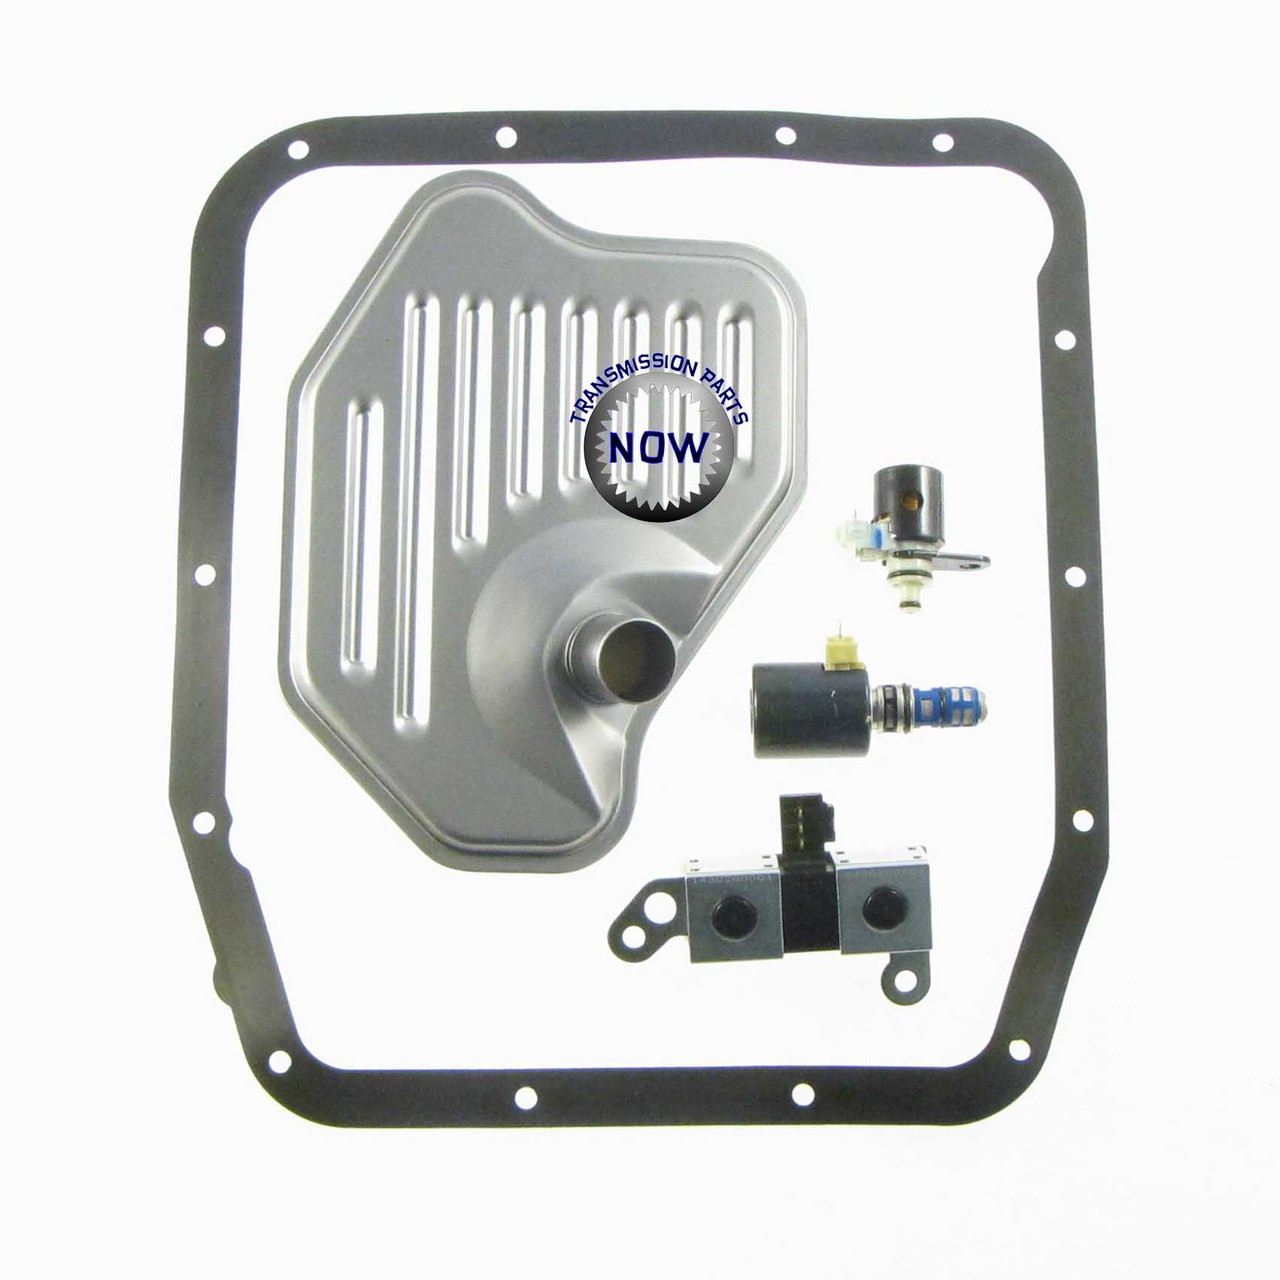 2004-2008 4R70E 4R70W 4R75E Solenoid kit & filter kit